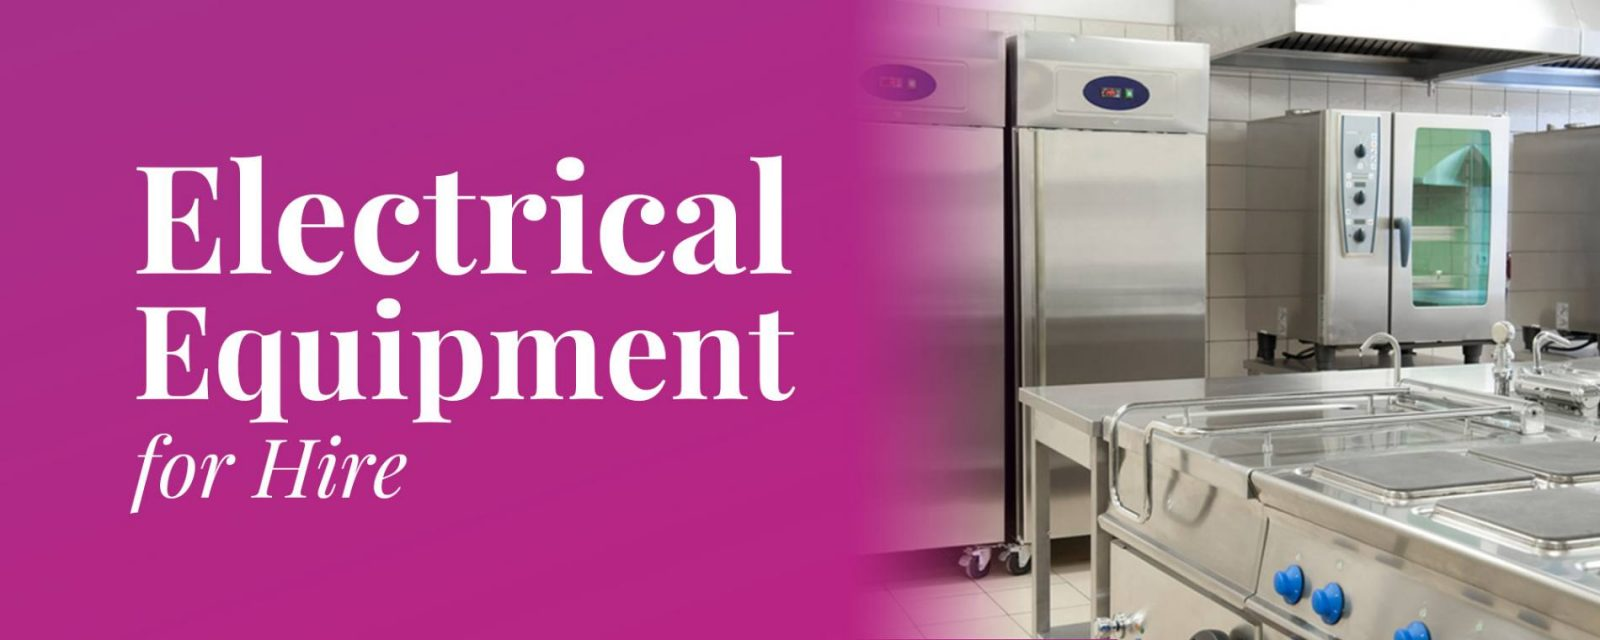 Electrical Euipment